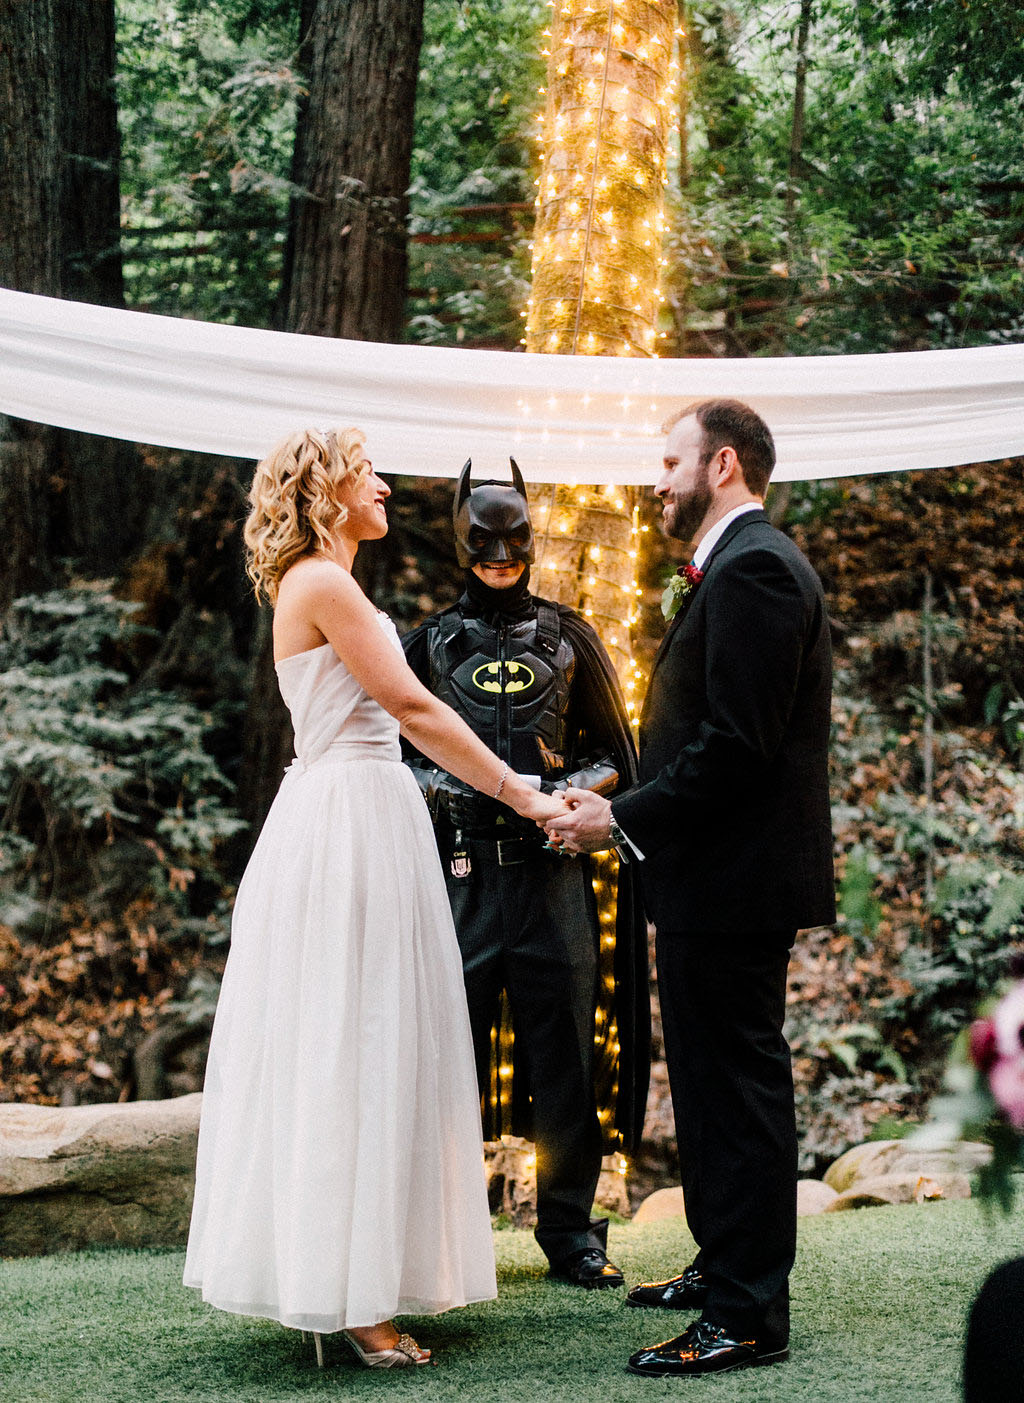 Casual Wedding Officiated by Batman · Rock n Roll Bride